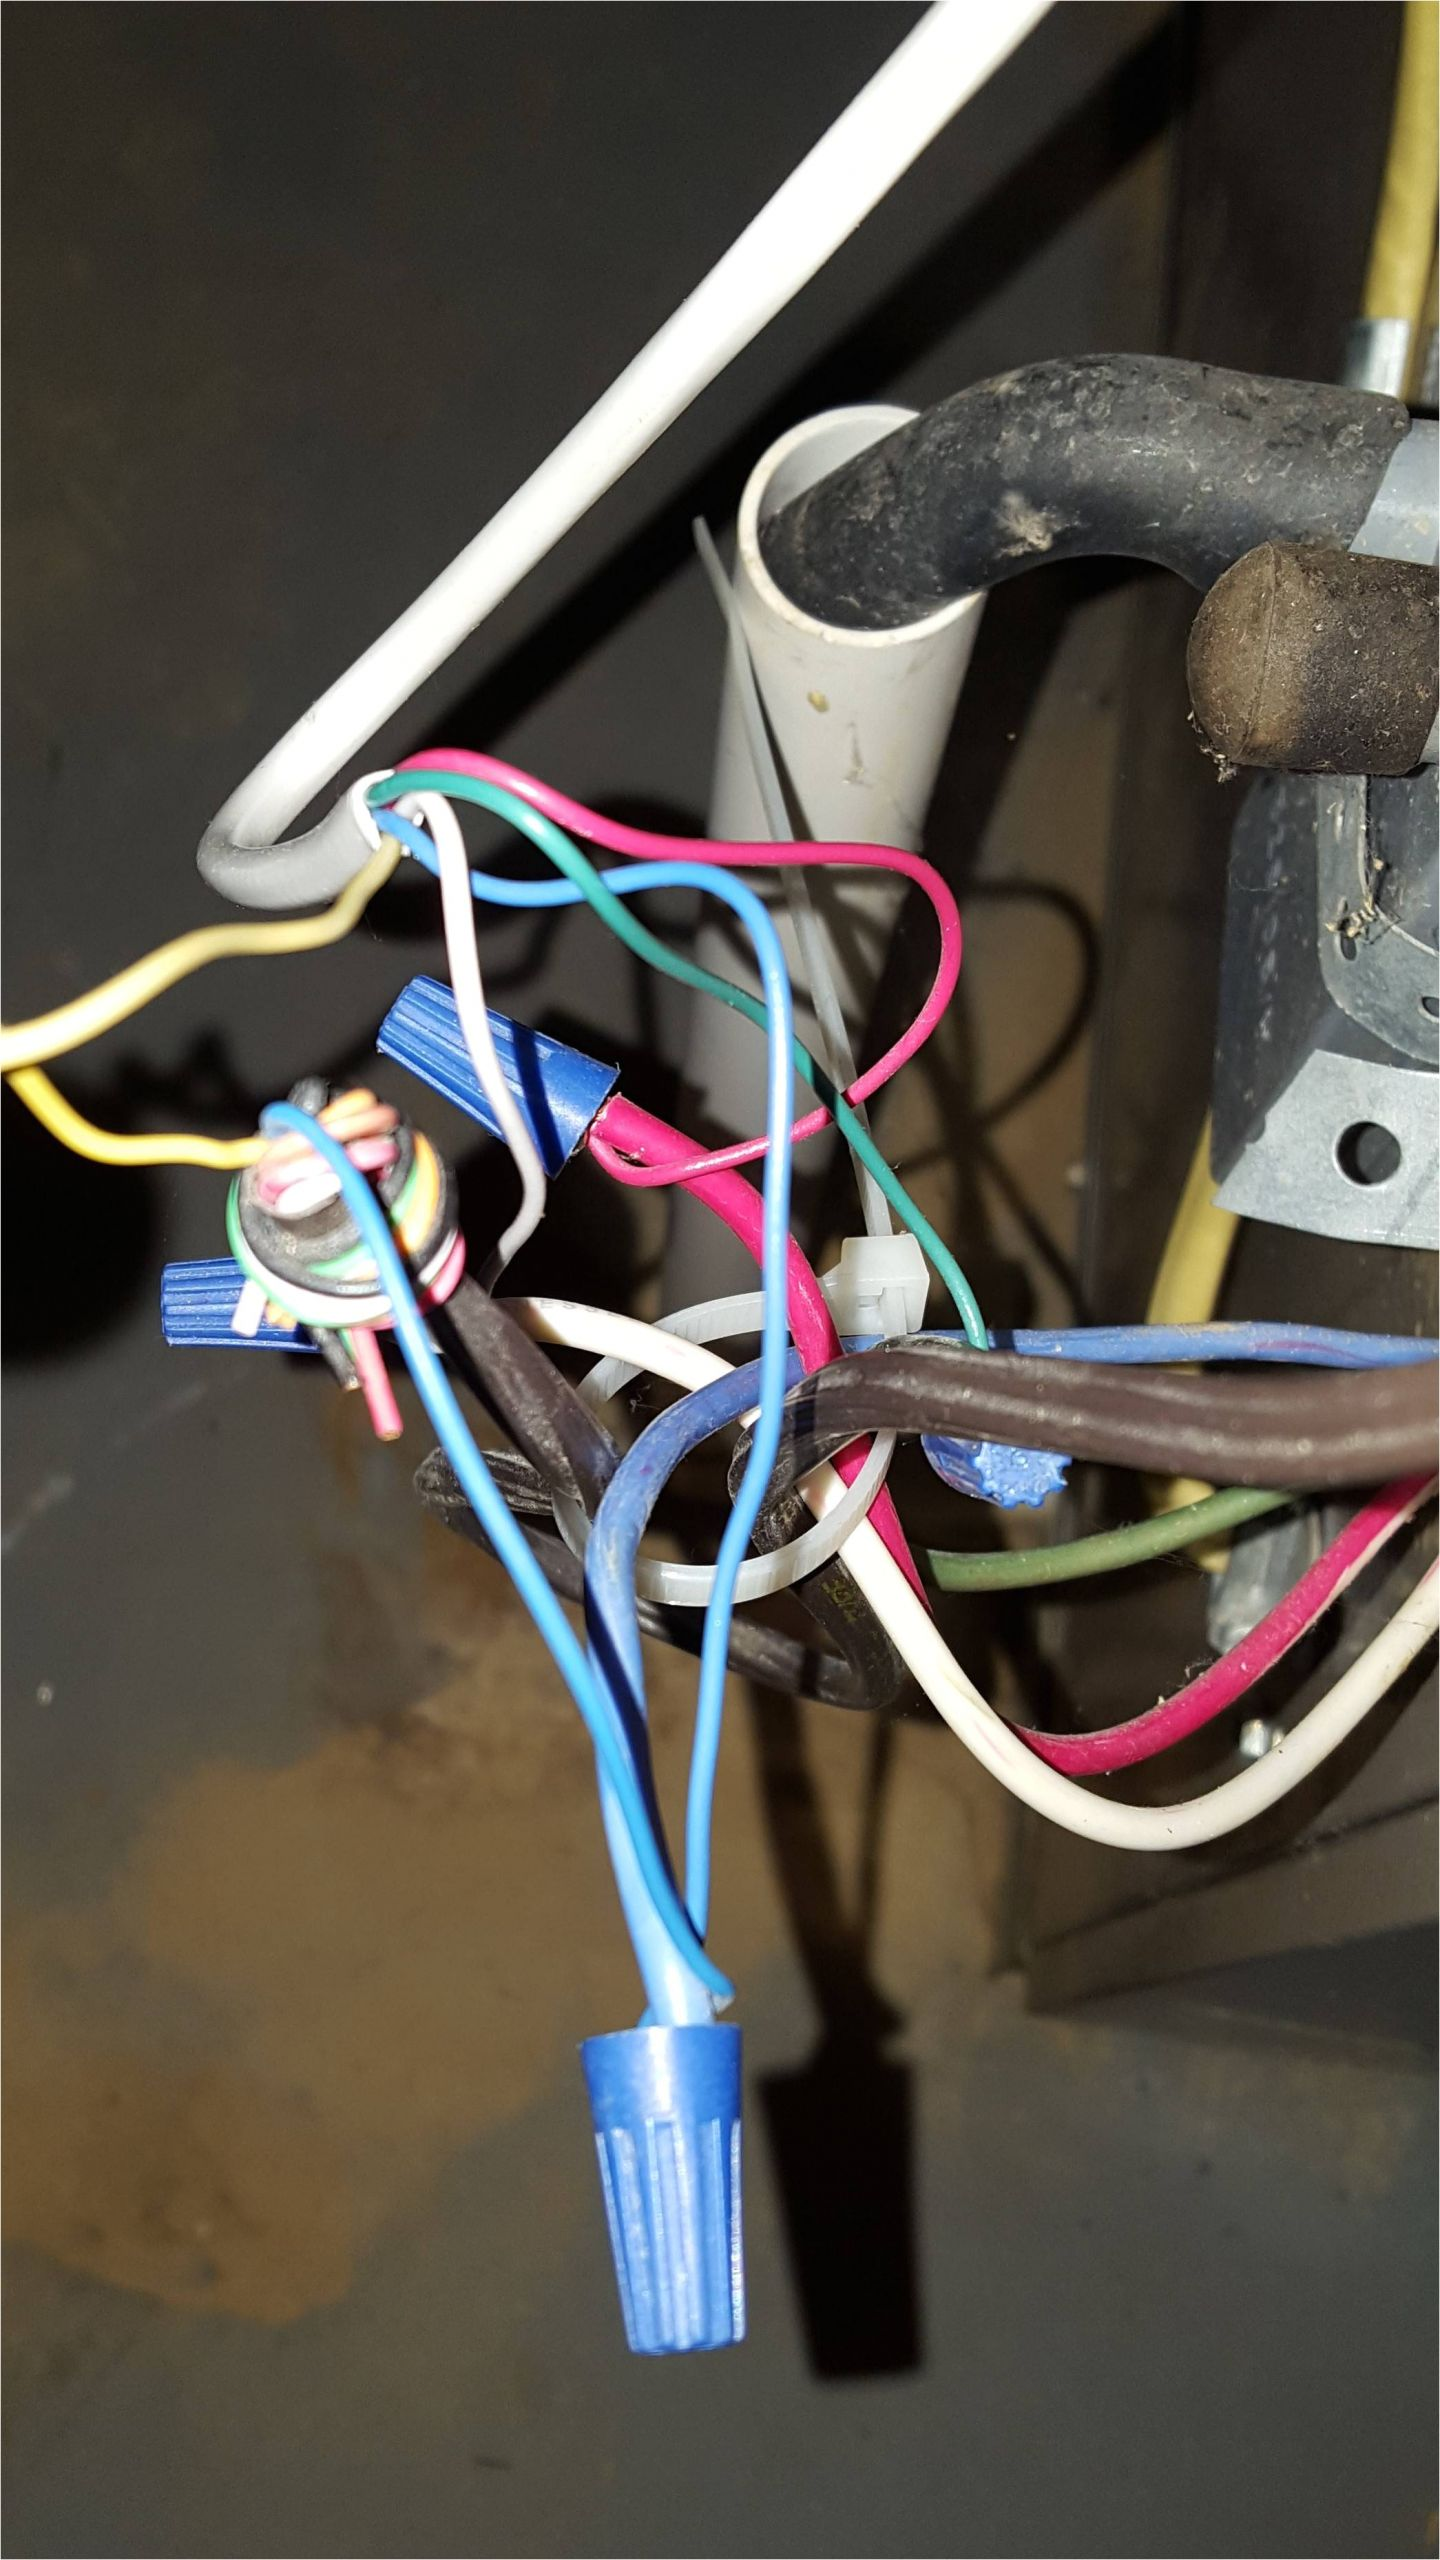 Goodman Hkr 10cb Wiring Diagram 0b9 Janitrol Furnace Wiring Diagram Only Wiring Library